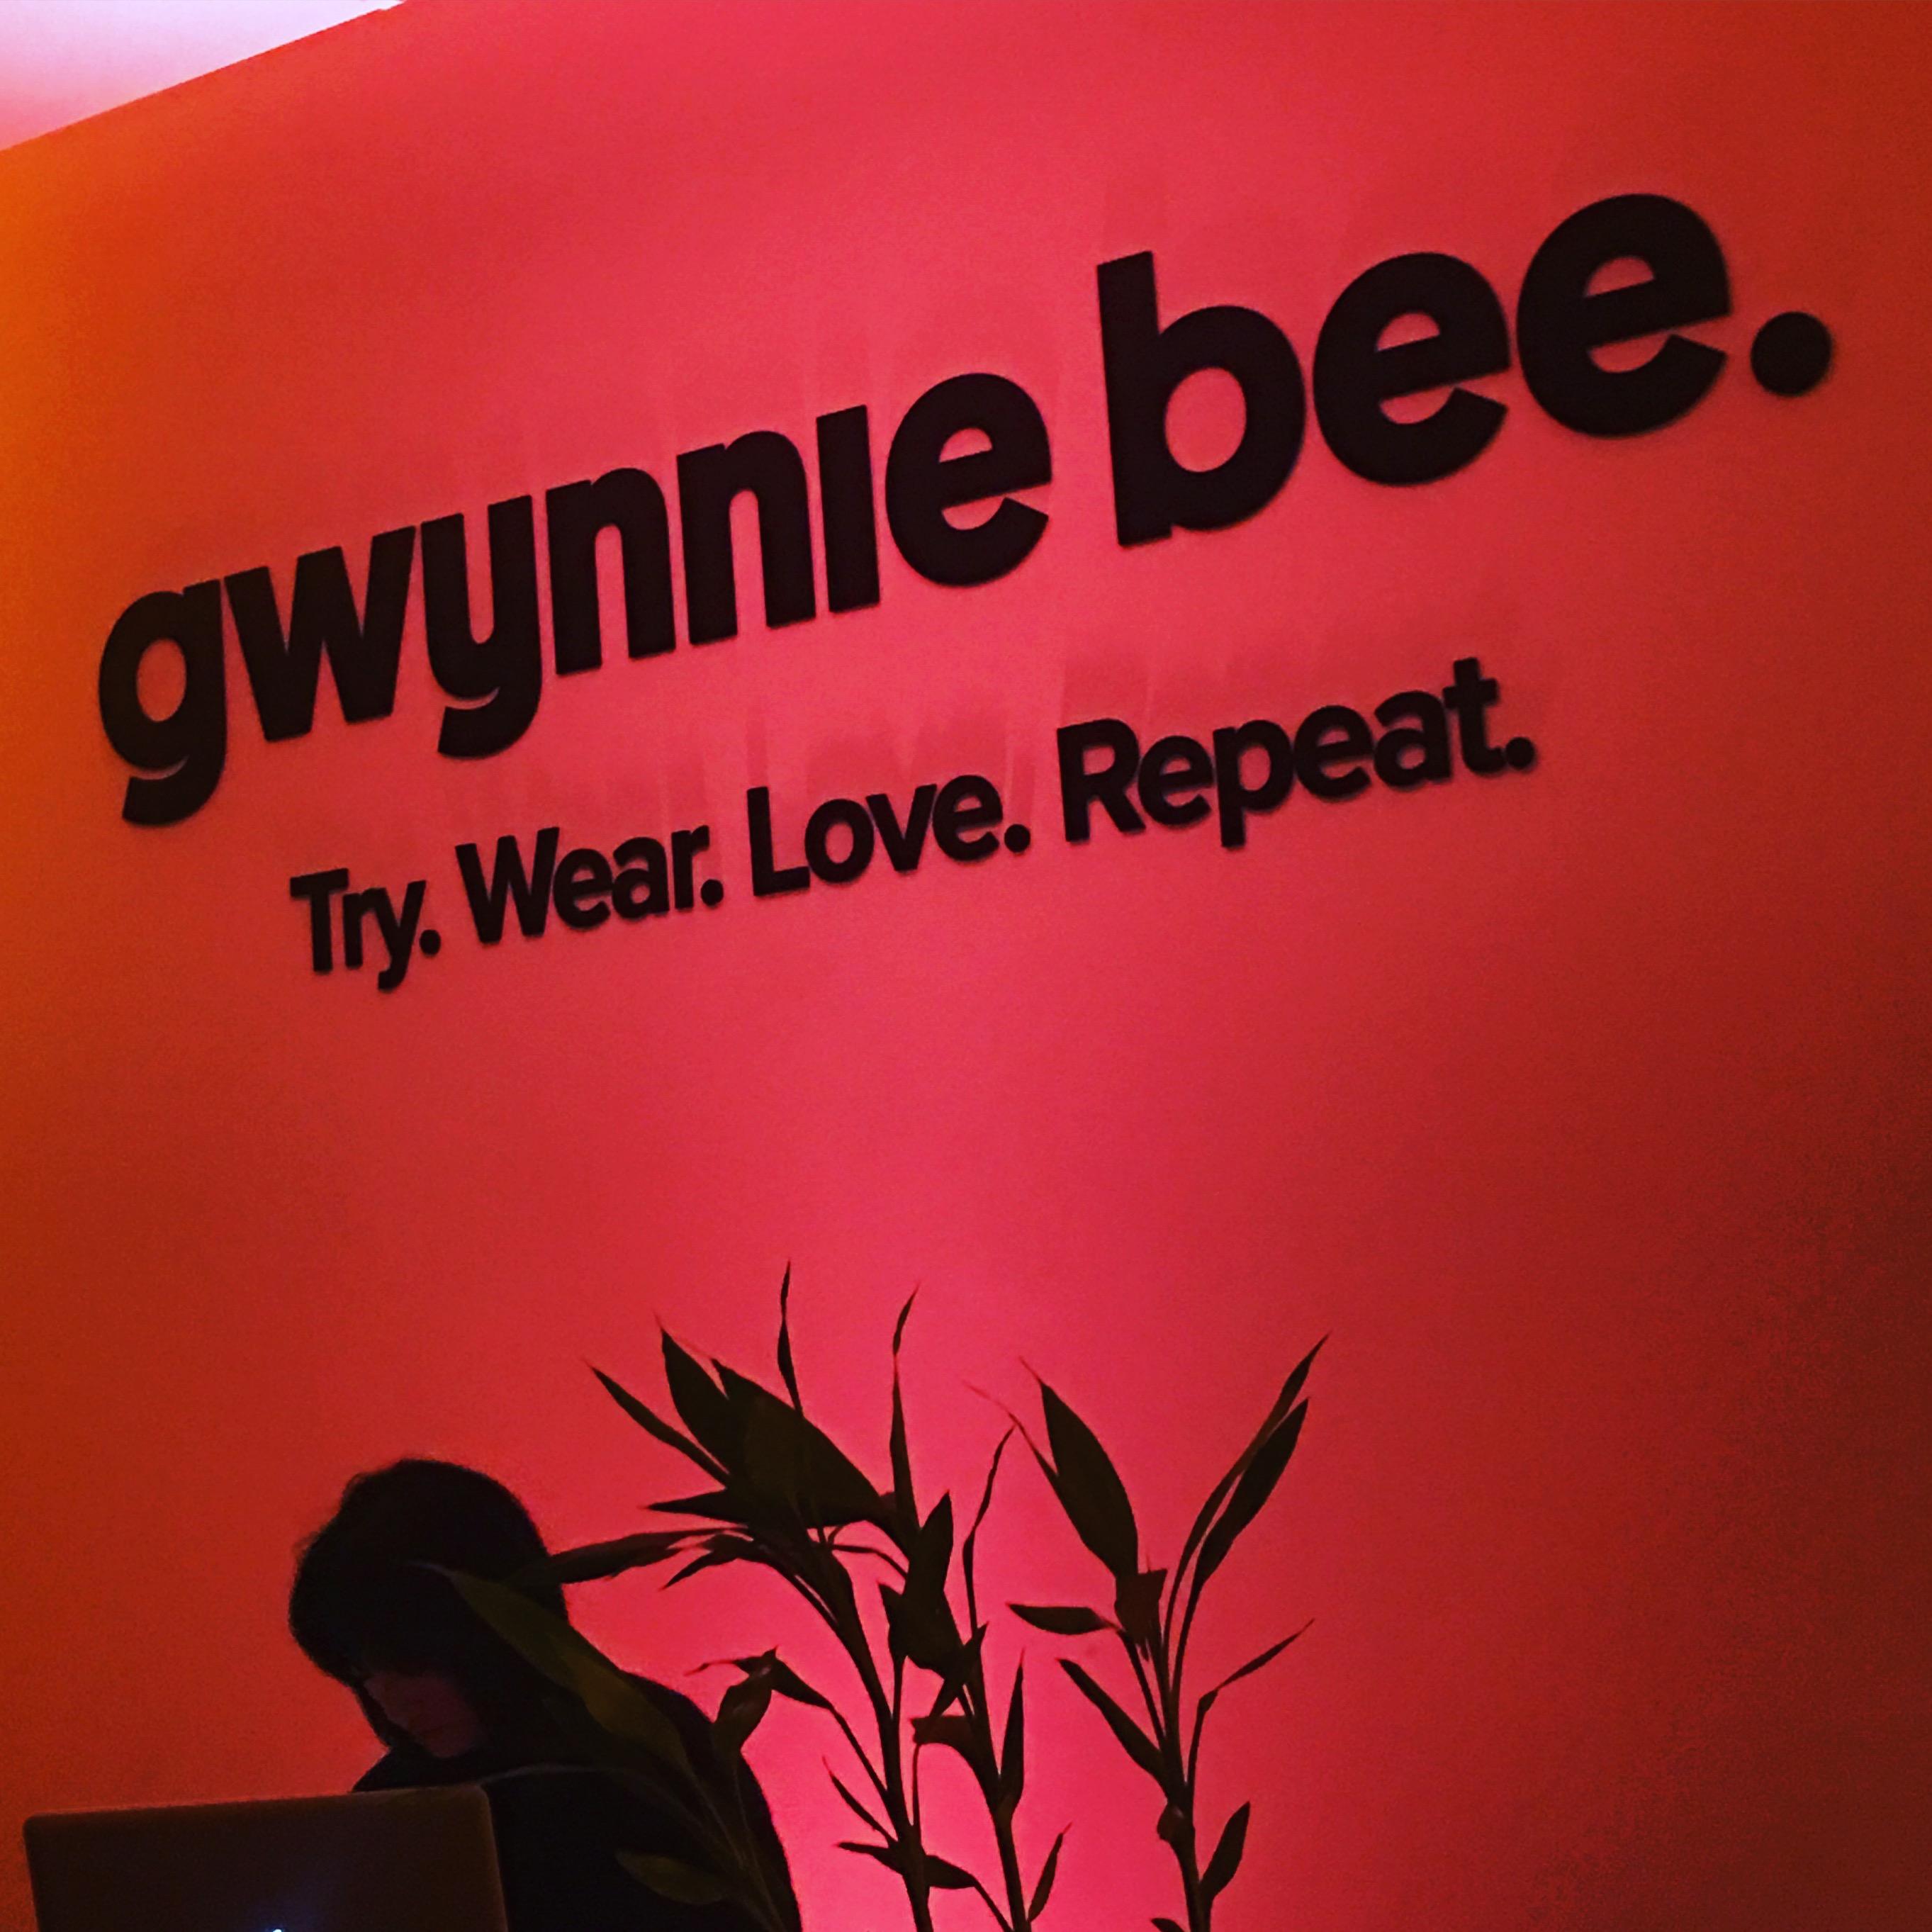 Gwynnie Bee. Try. Wear. Love. Repeat.